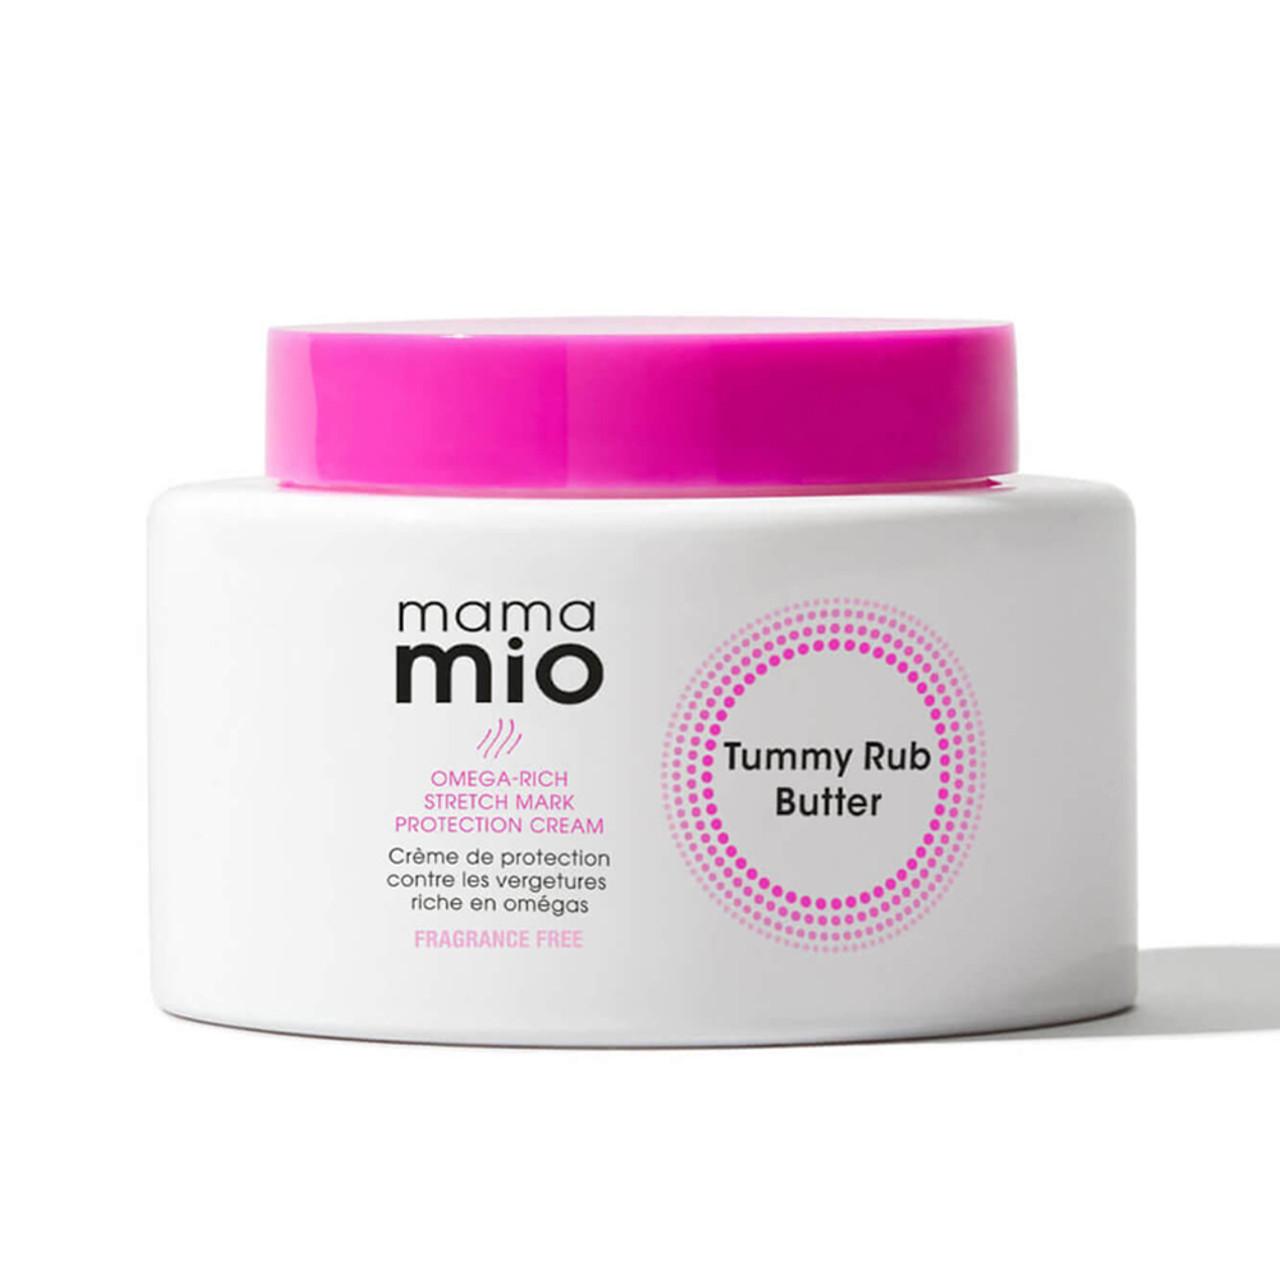 Mama Mio Tummy Rub Butter - Fragrance Free